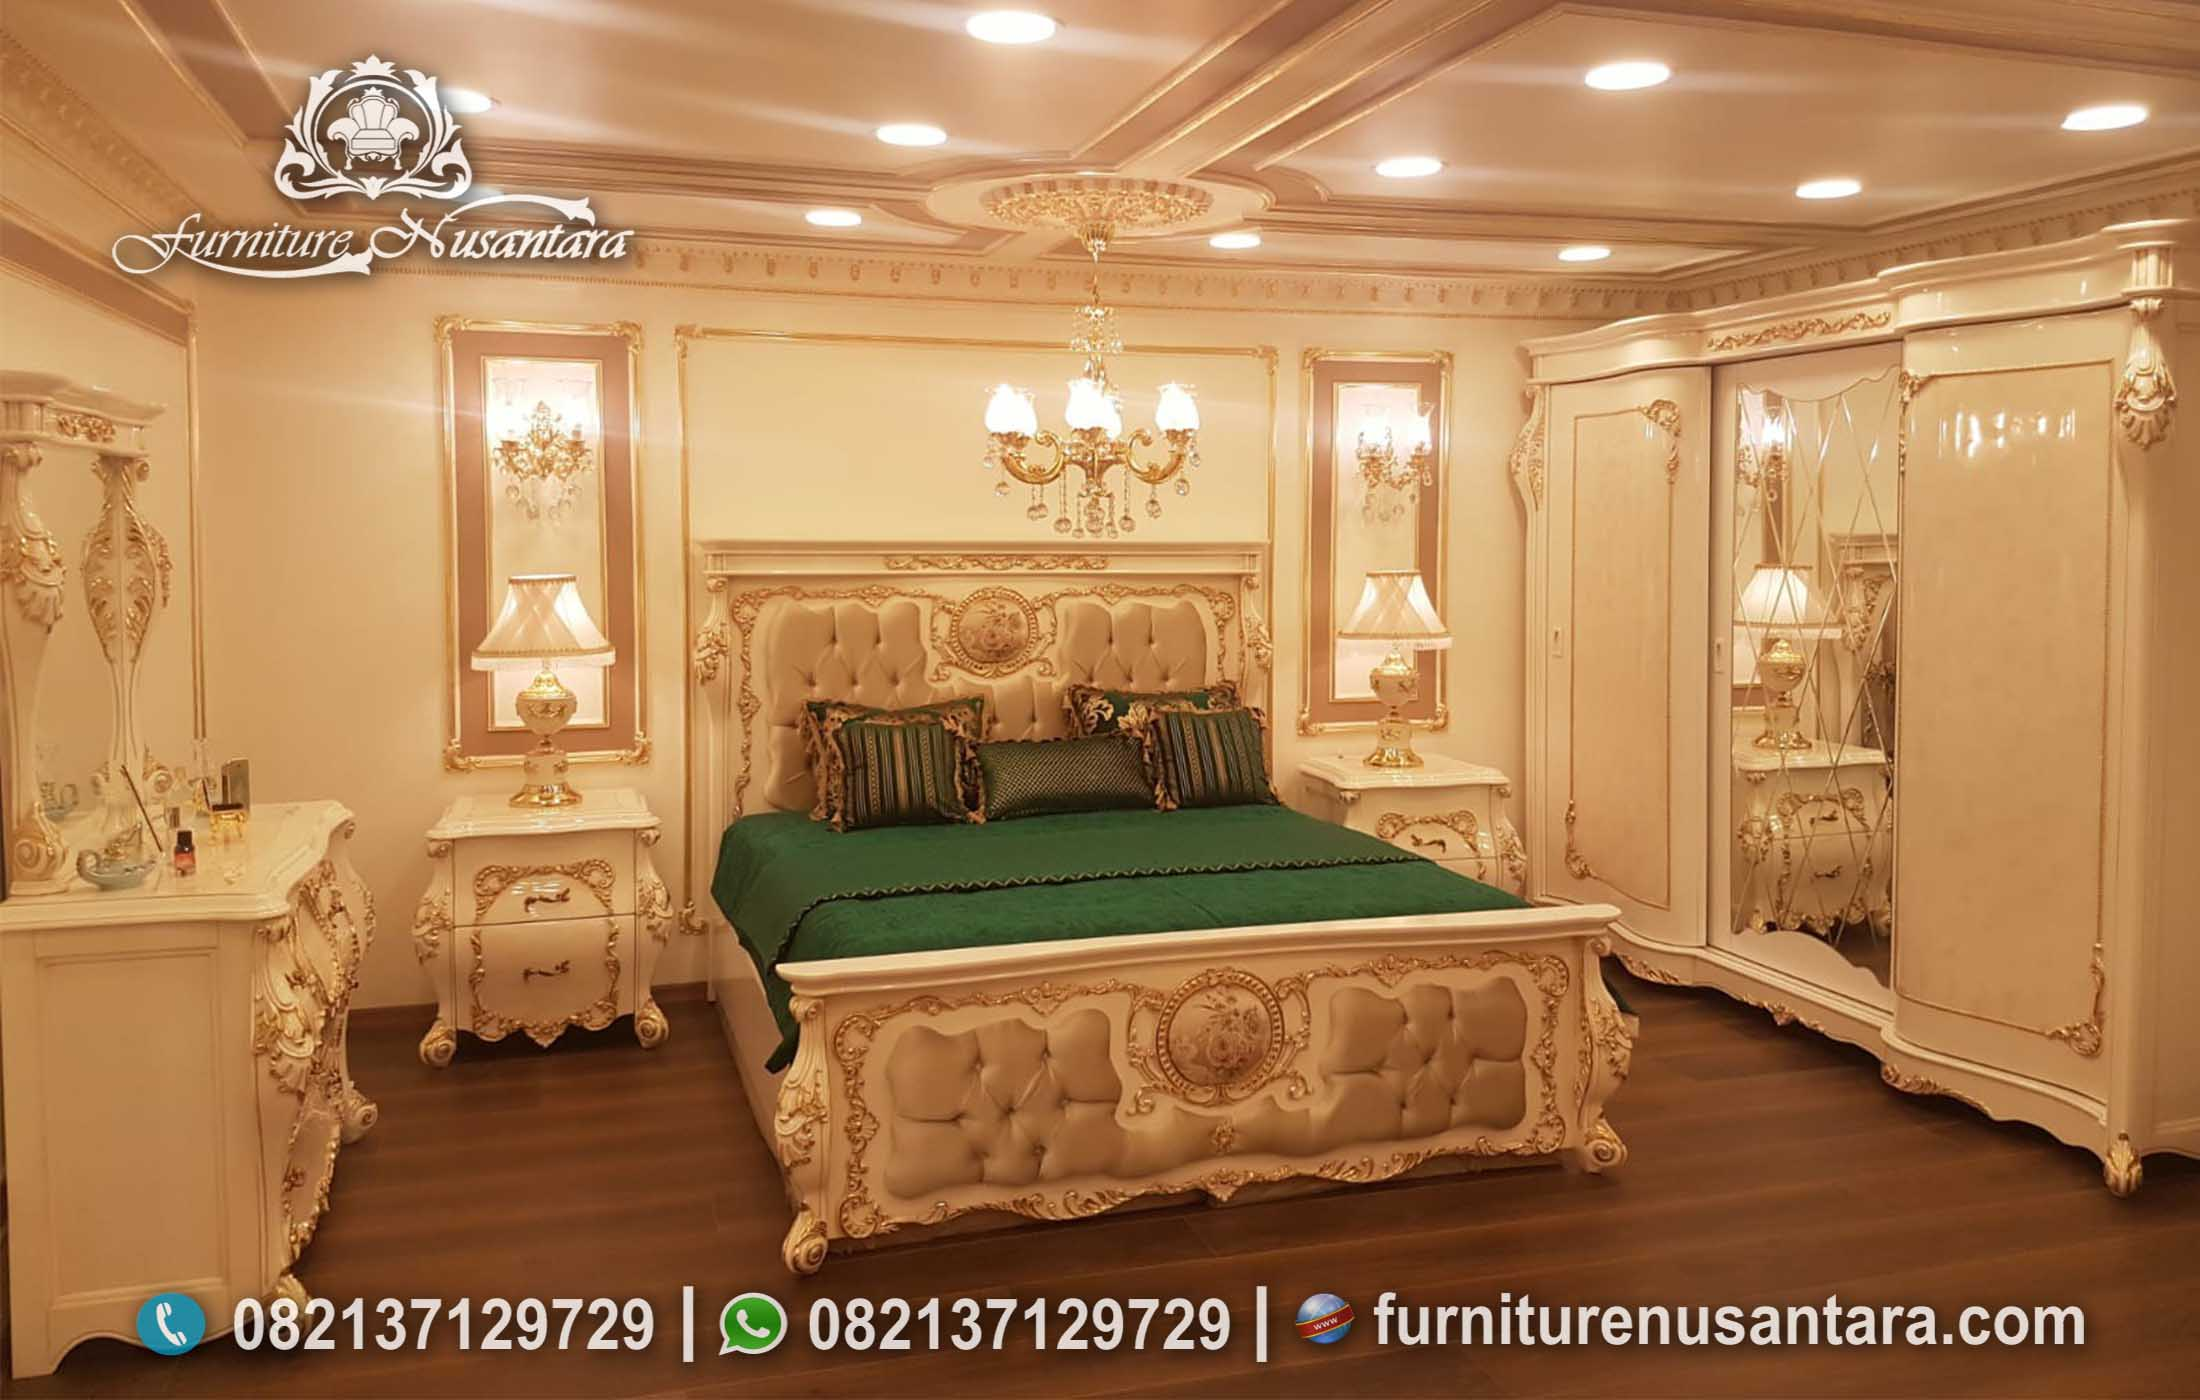 Kamar Tidur Klasik Modern KS-112, Furniture Nusantara